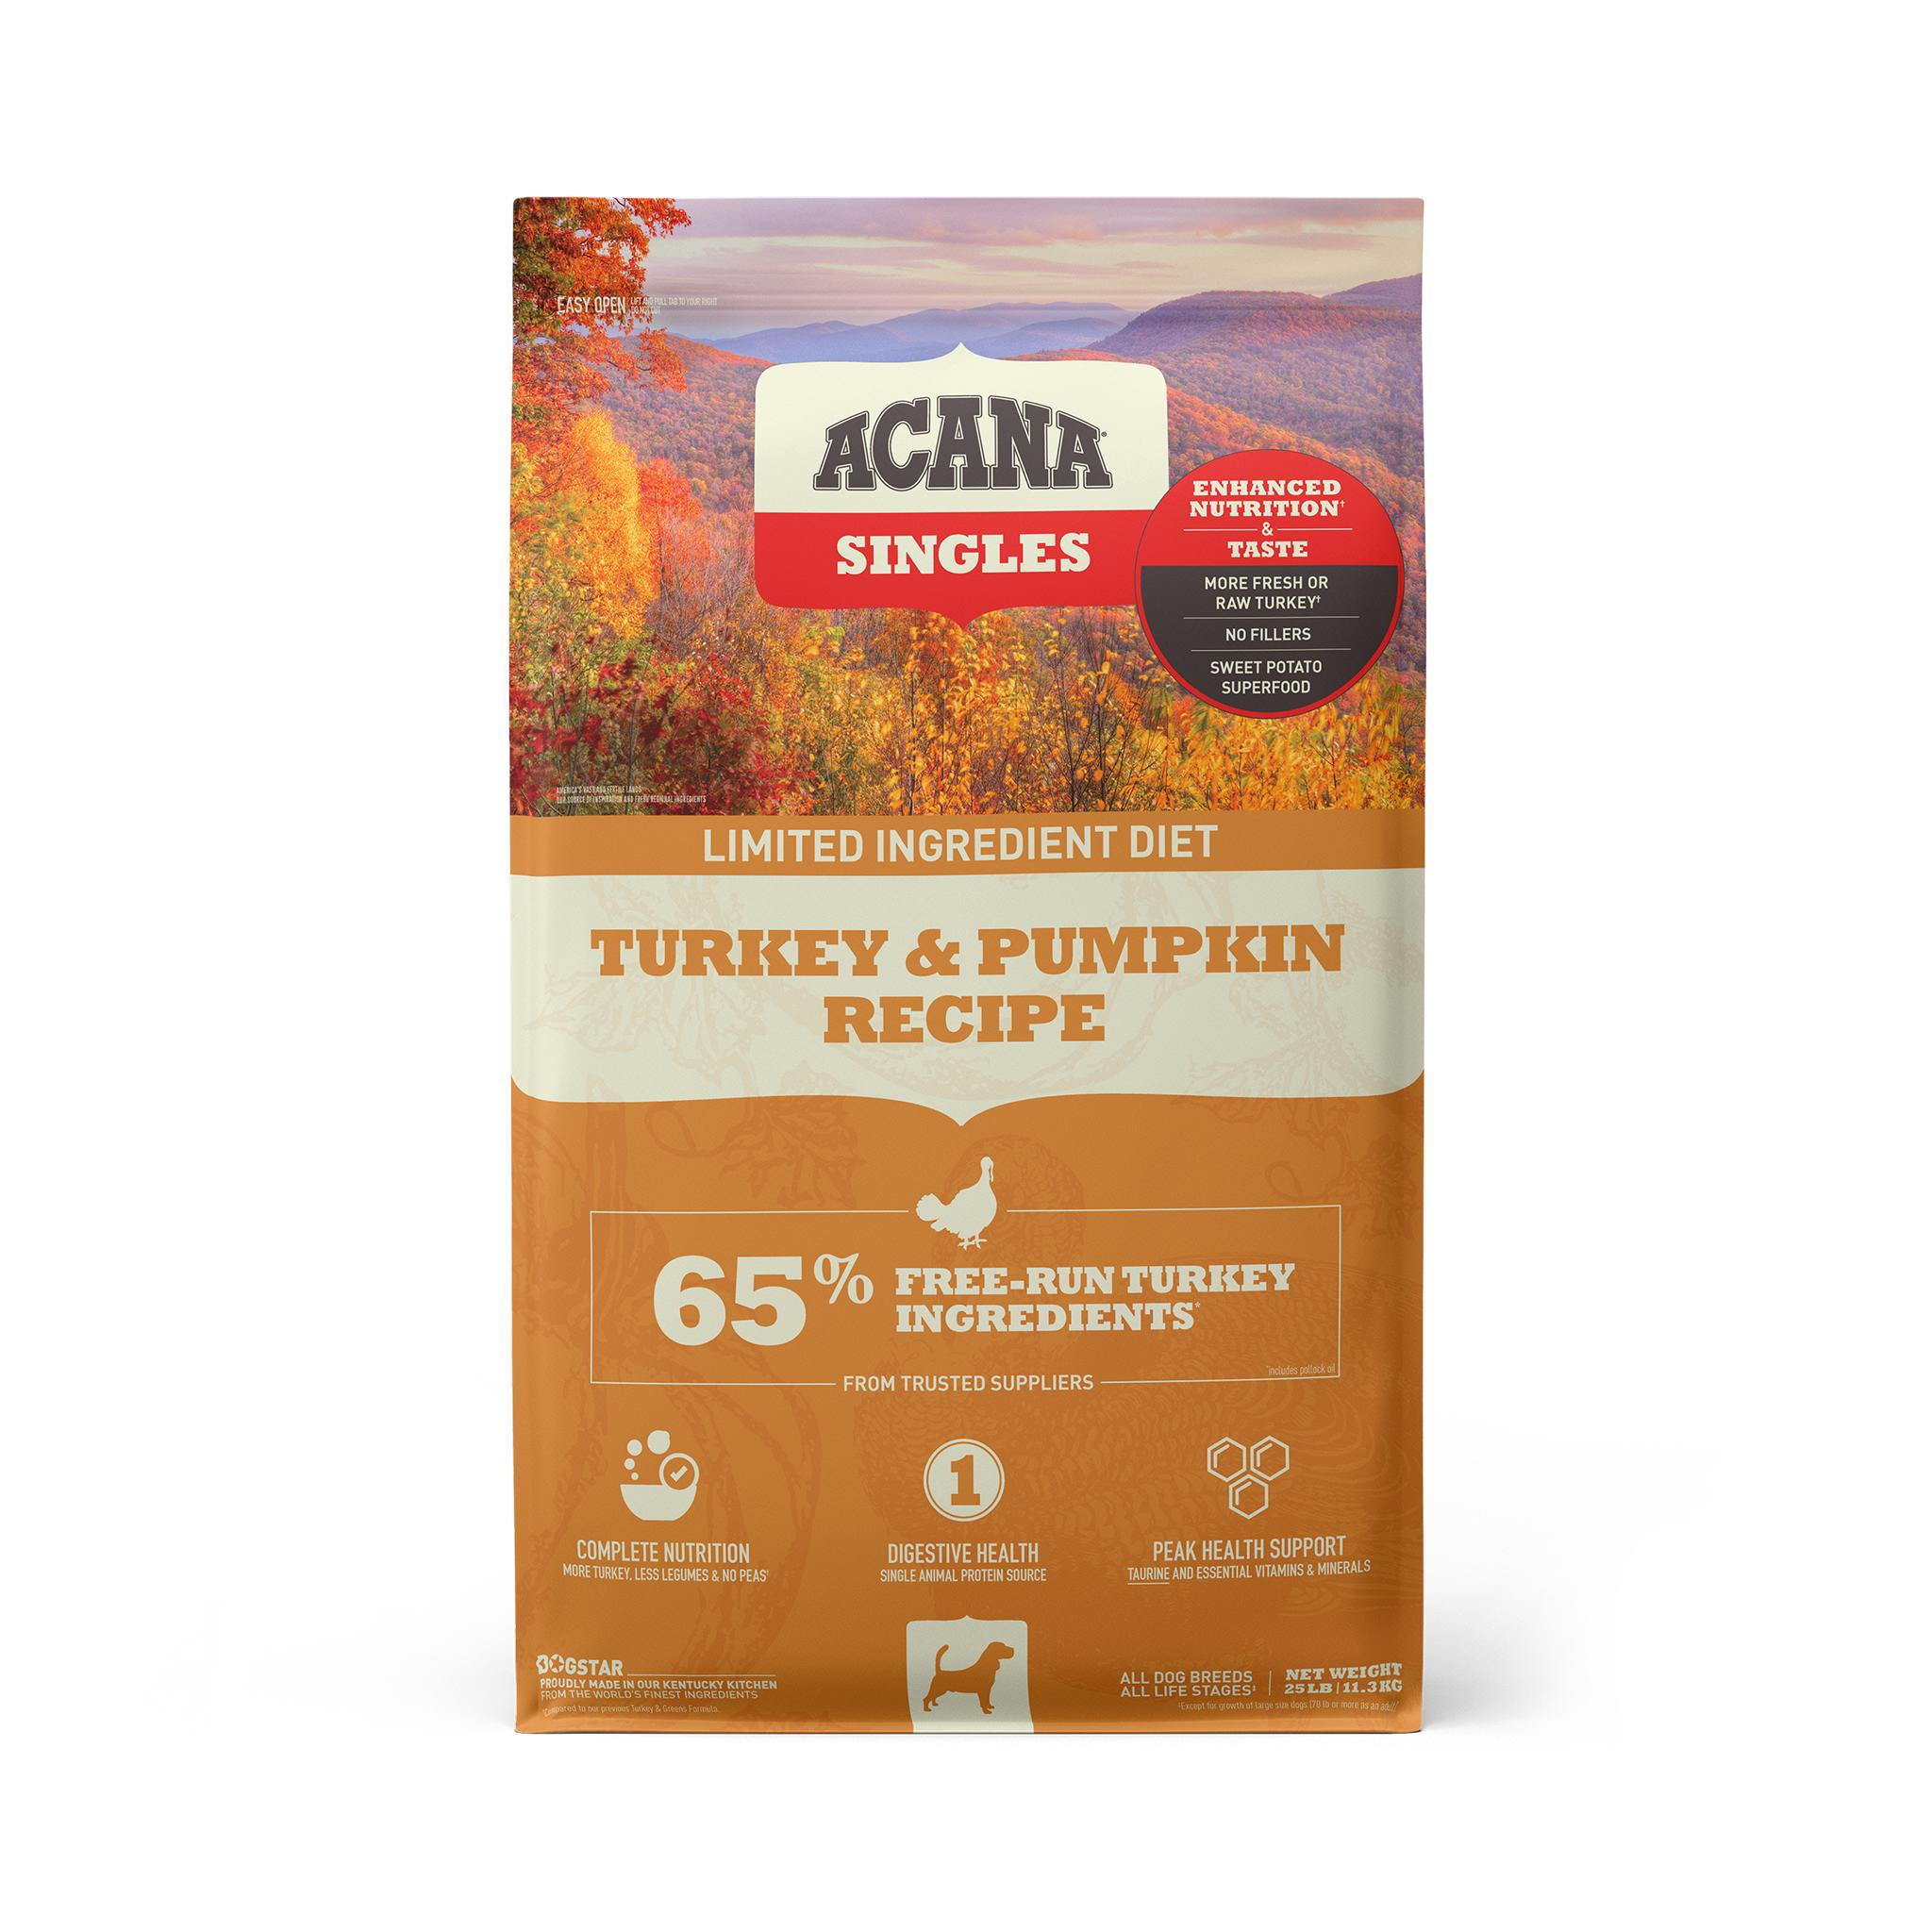 ACANA Singles Limited Ingredient Turkey & Pumpkin Grain-Free Dry Dog Food, 25-lb